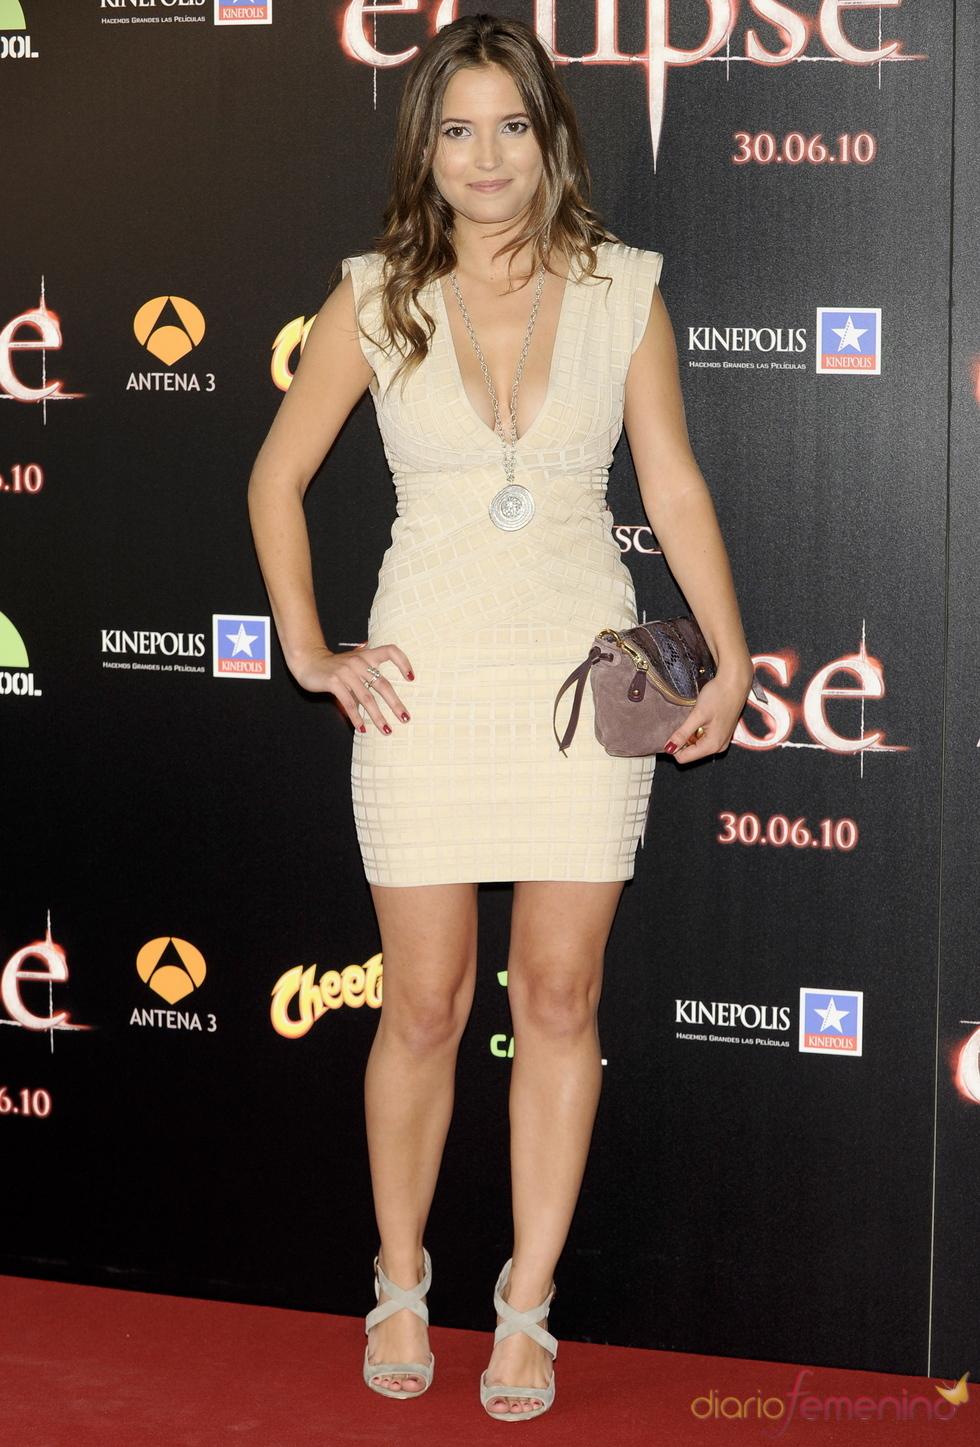 Ana Fernández en la premiere de 'Eclipse' en Madrid